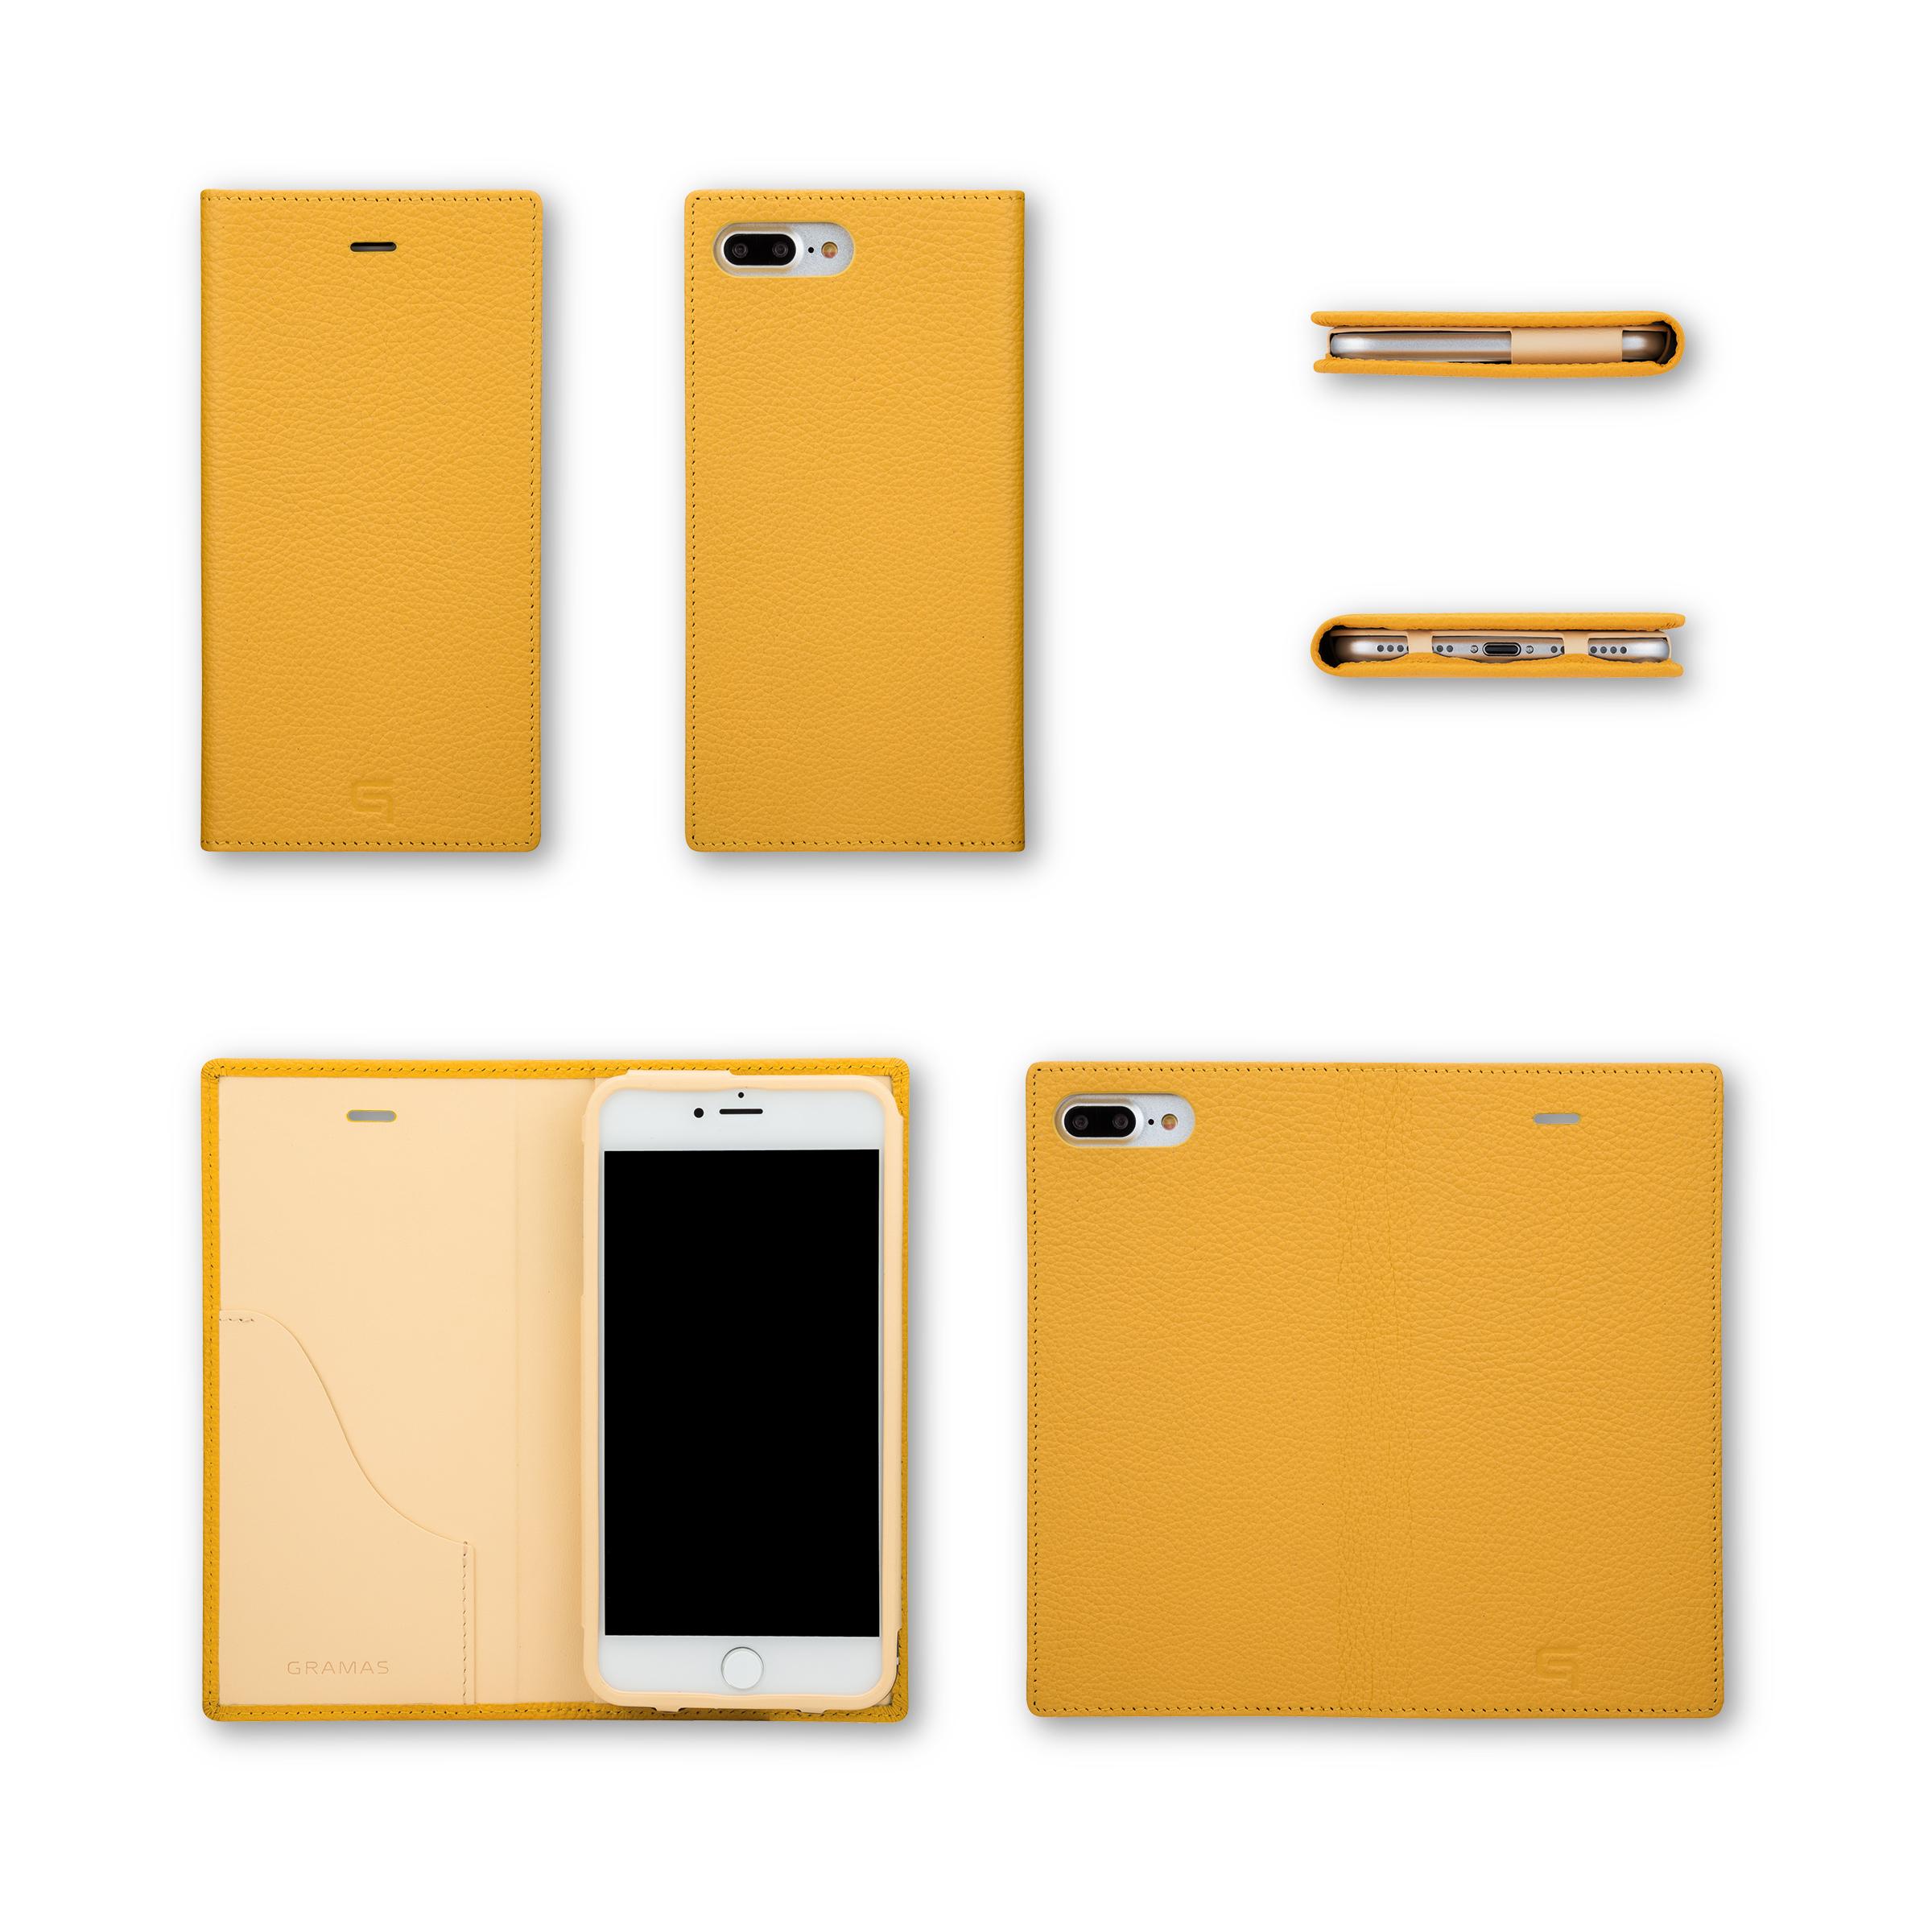 GRAMAS Shrunken-calf Full Leather Case for iPhone 7 Plus(Yellow) シュランケンカーフ 手帳型フルレザーケース - 画像5